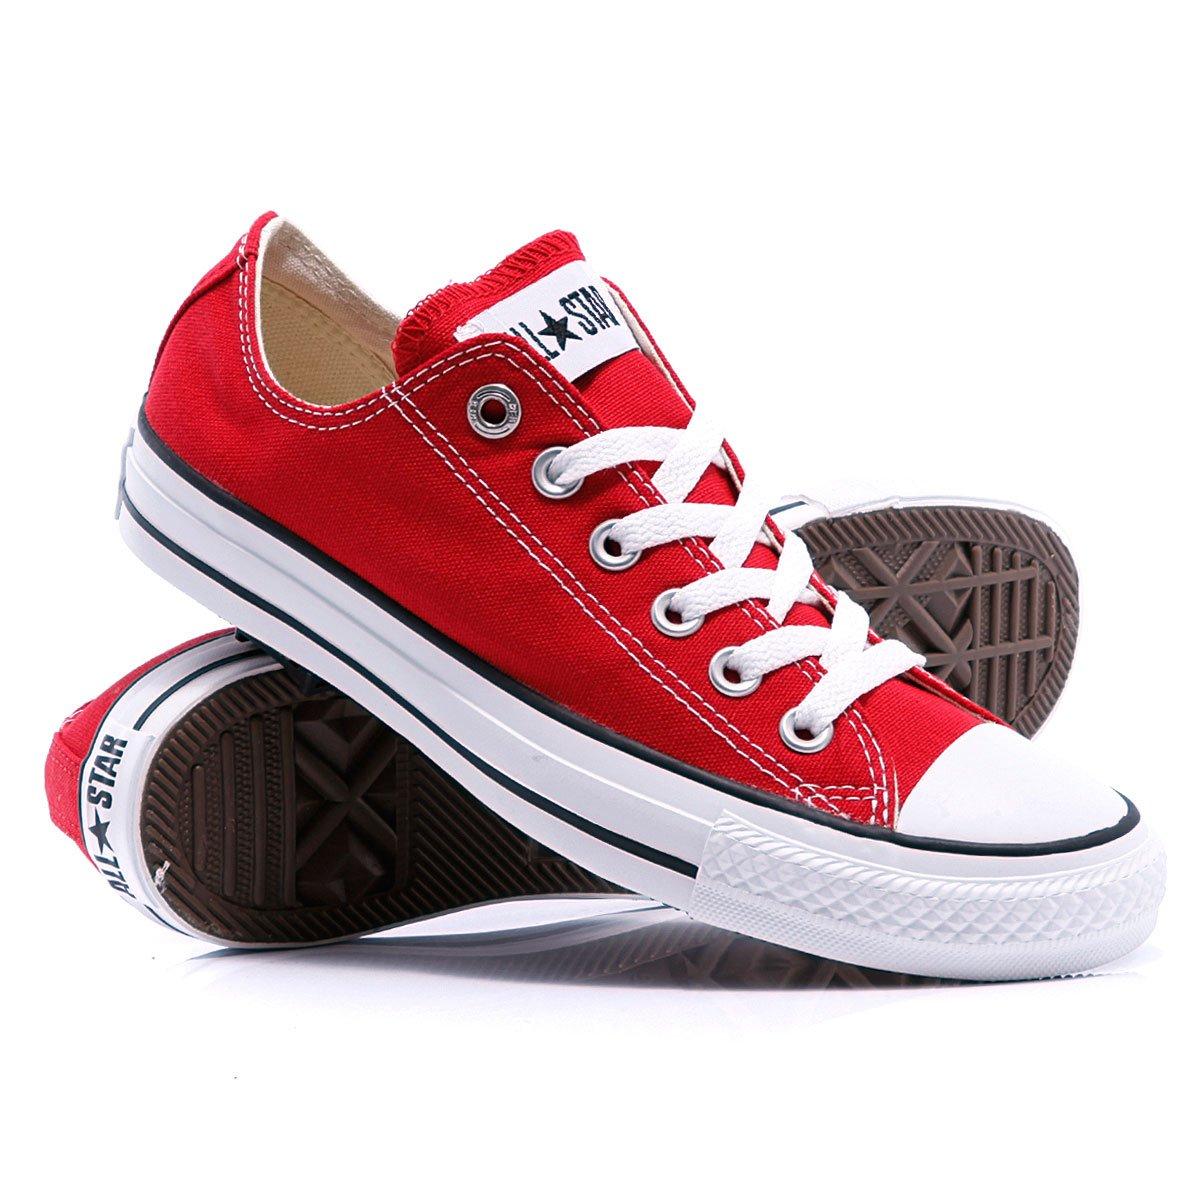 597da0664aec Купить кеды низкие унисекс Converse All Star Ox Unisex Red ...